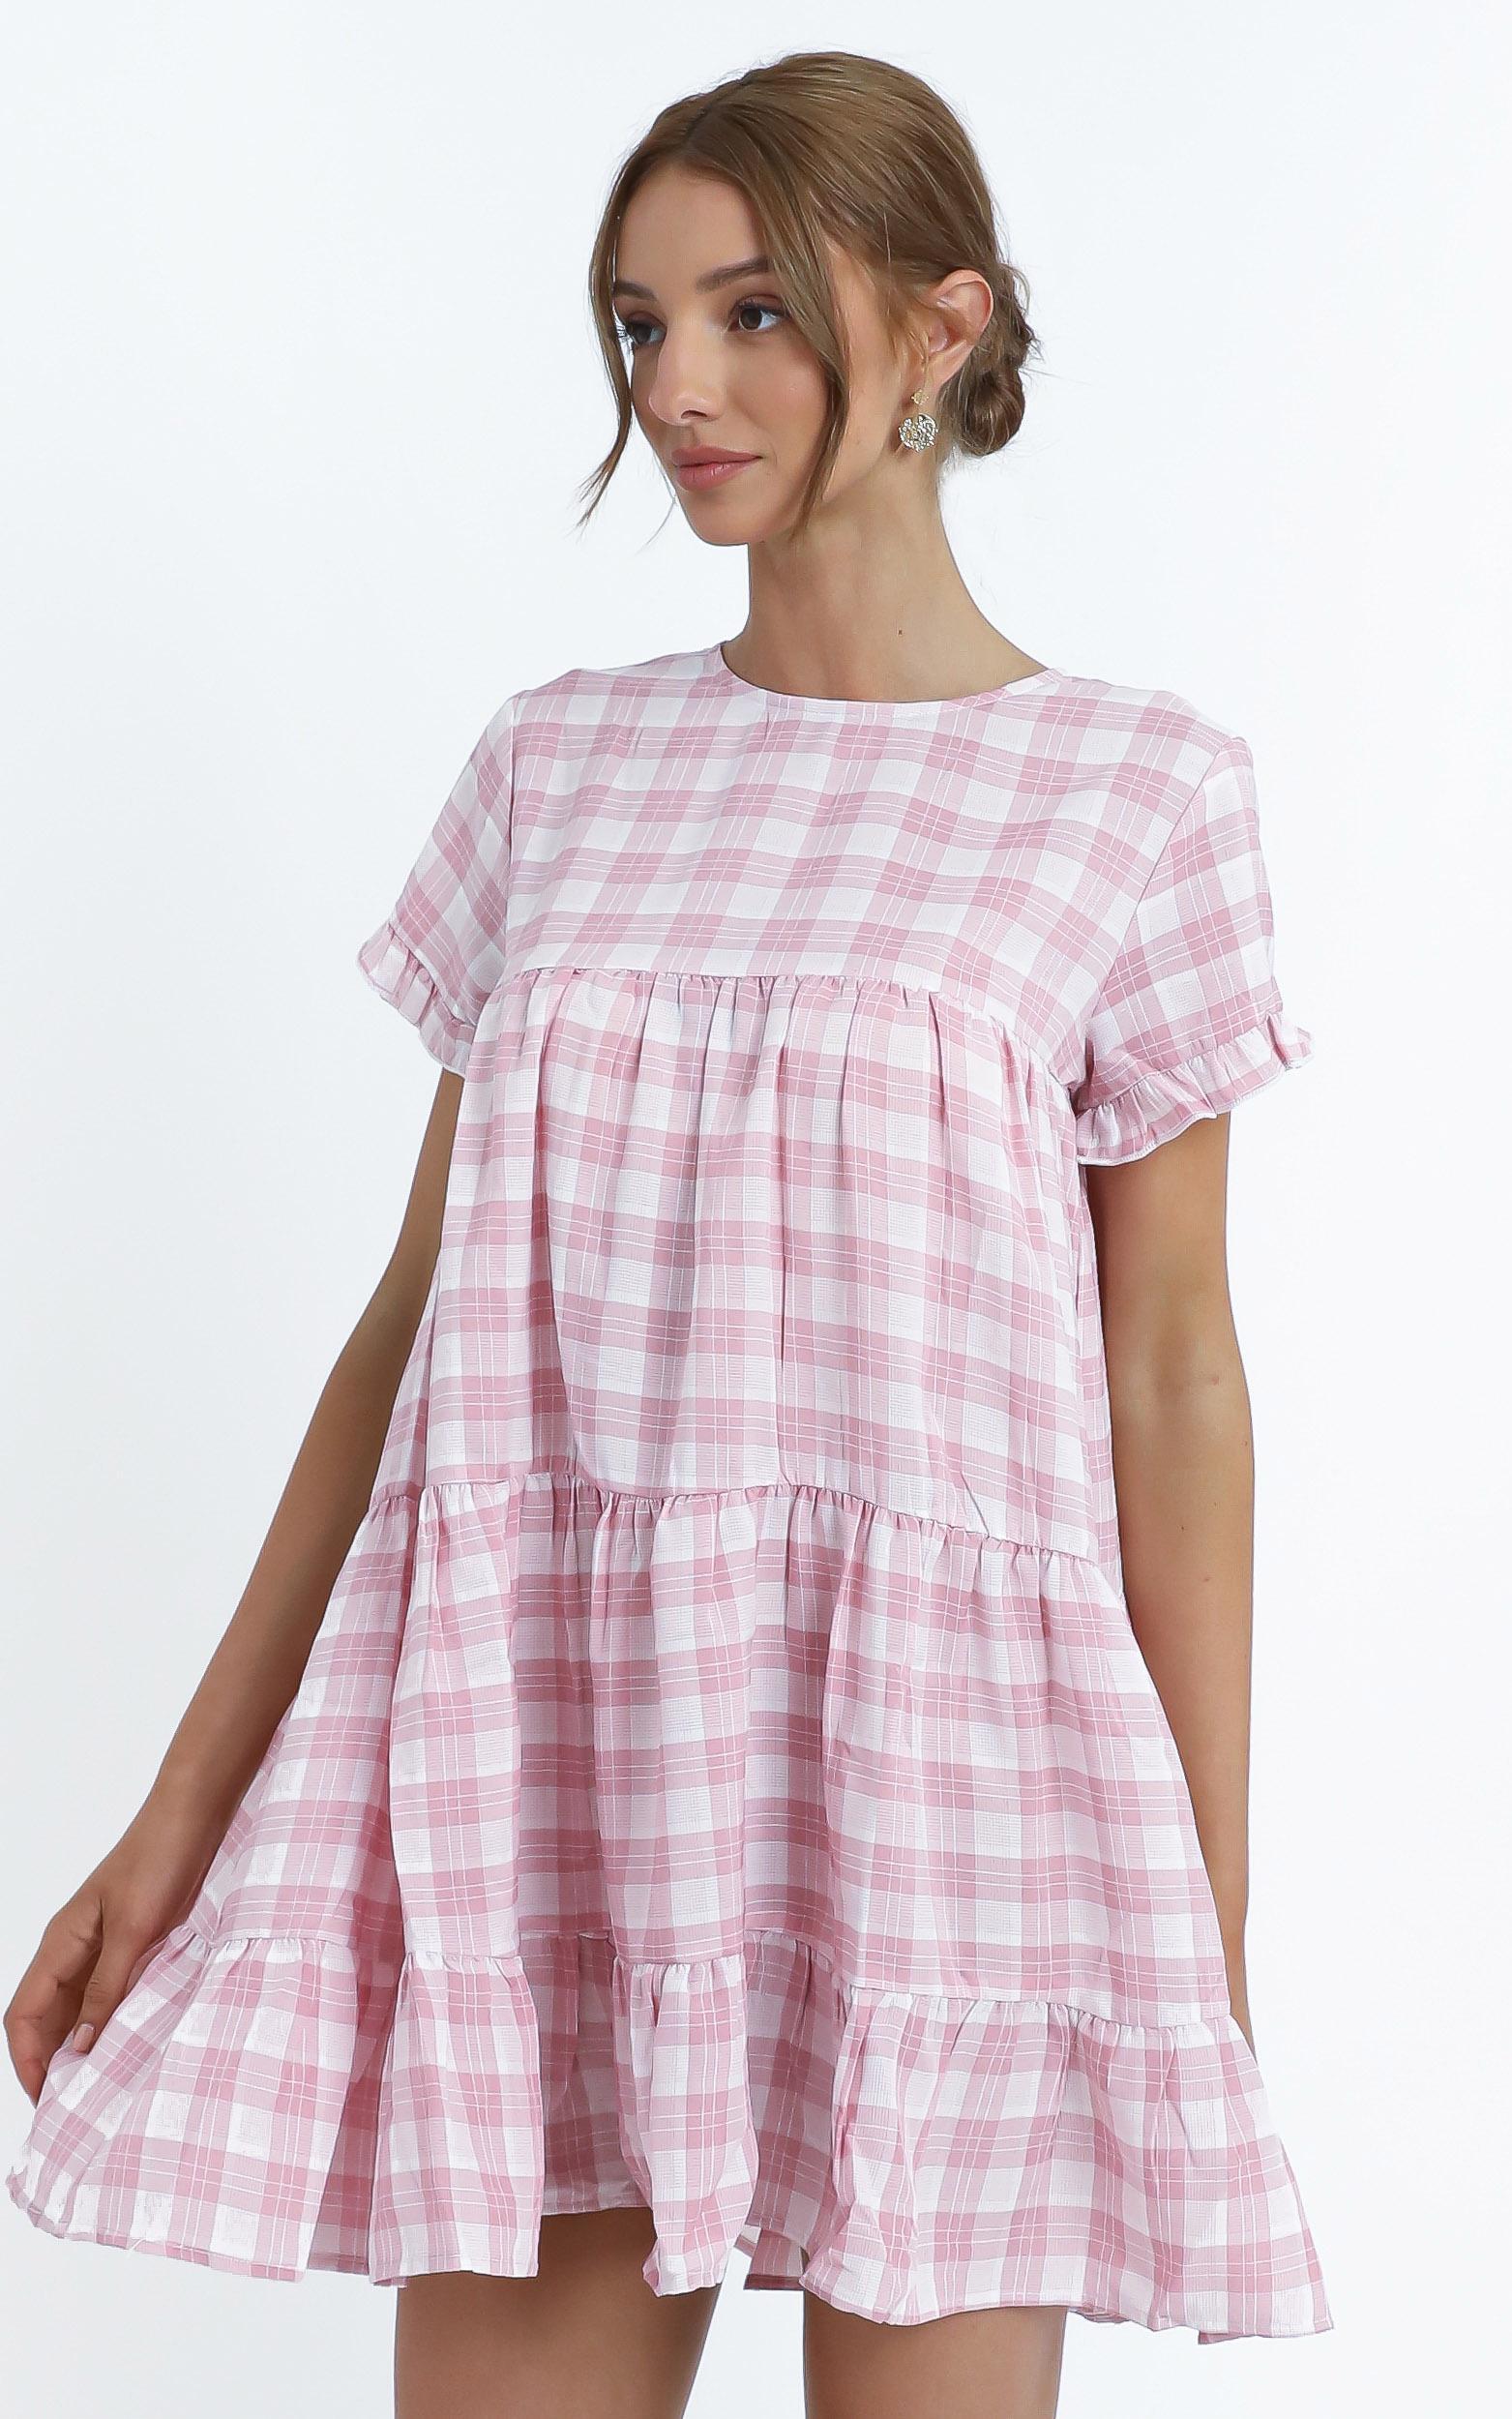 Elise Dress in Pink Check - 14 (XL), Blush, hi-res image number null